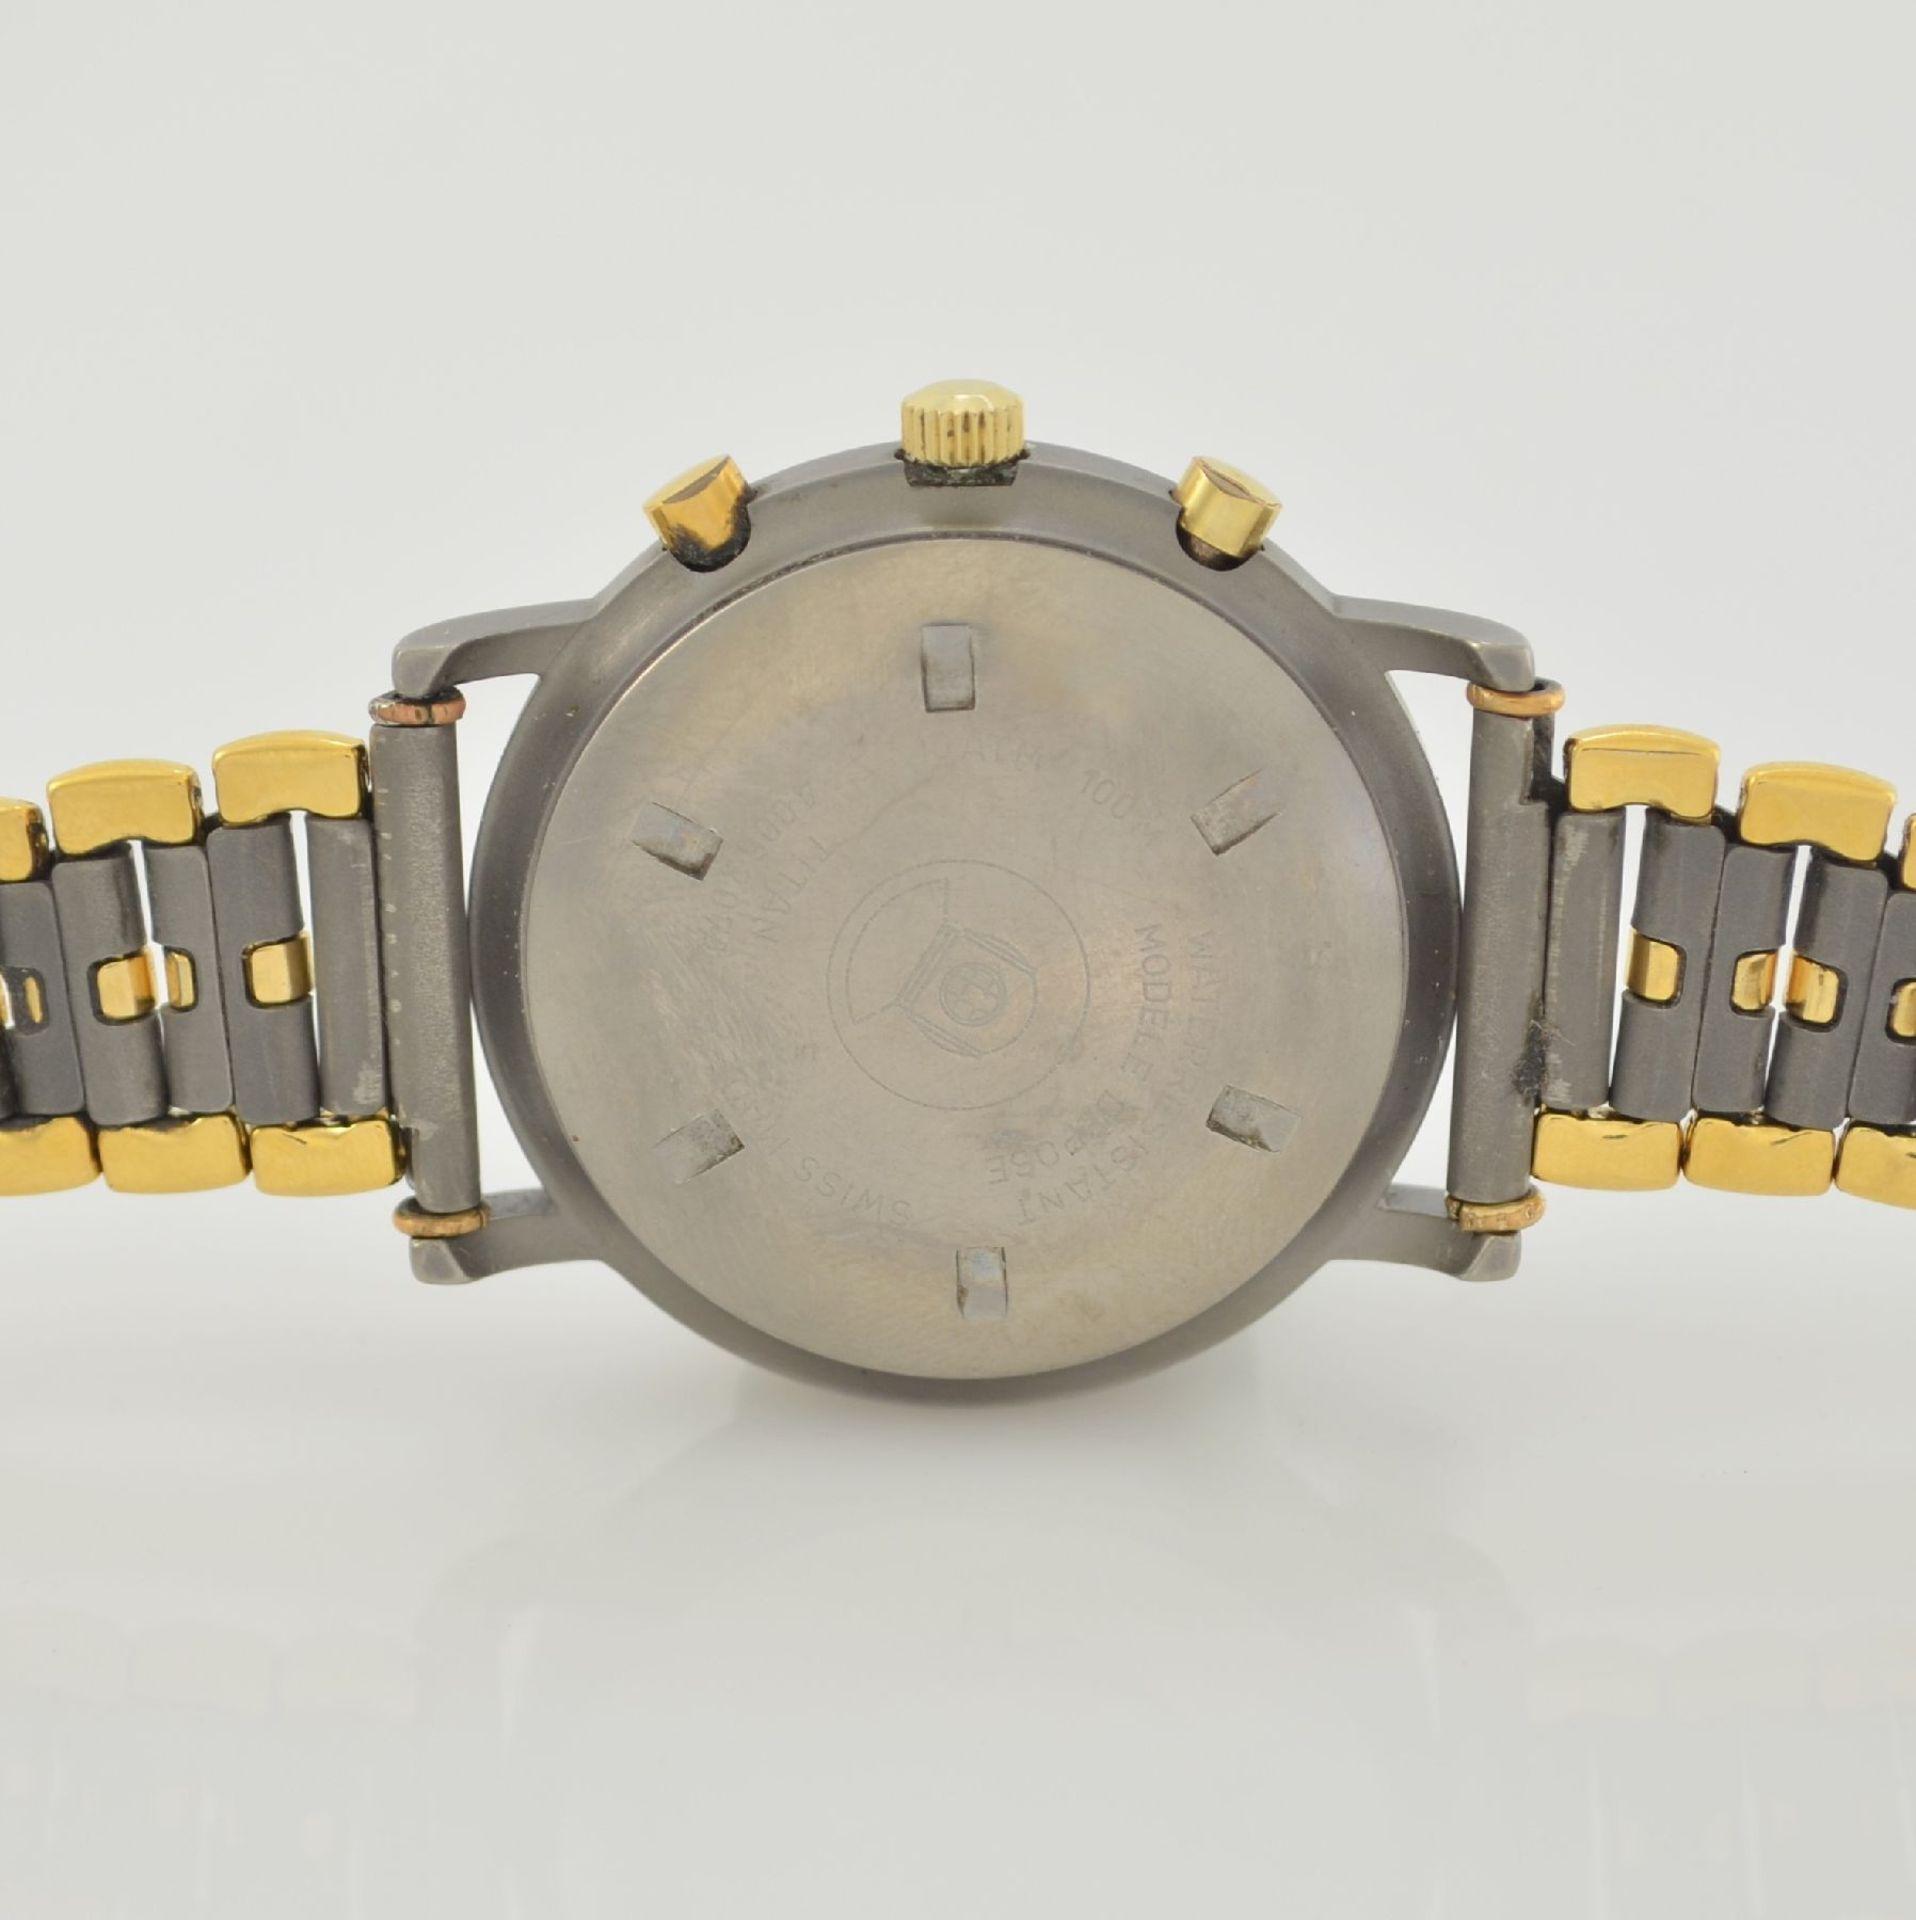 ZENTRA Herrenarmbanduhr Armbandchronograph, Automatik, Schweiz um 1987, Titangeh. inkl. - Bild 6 aus 6